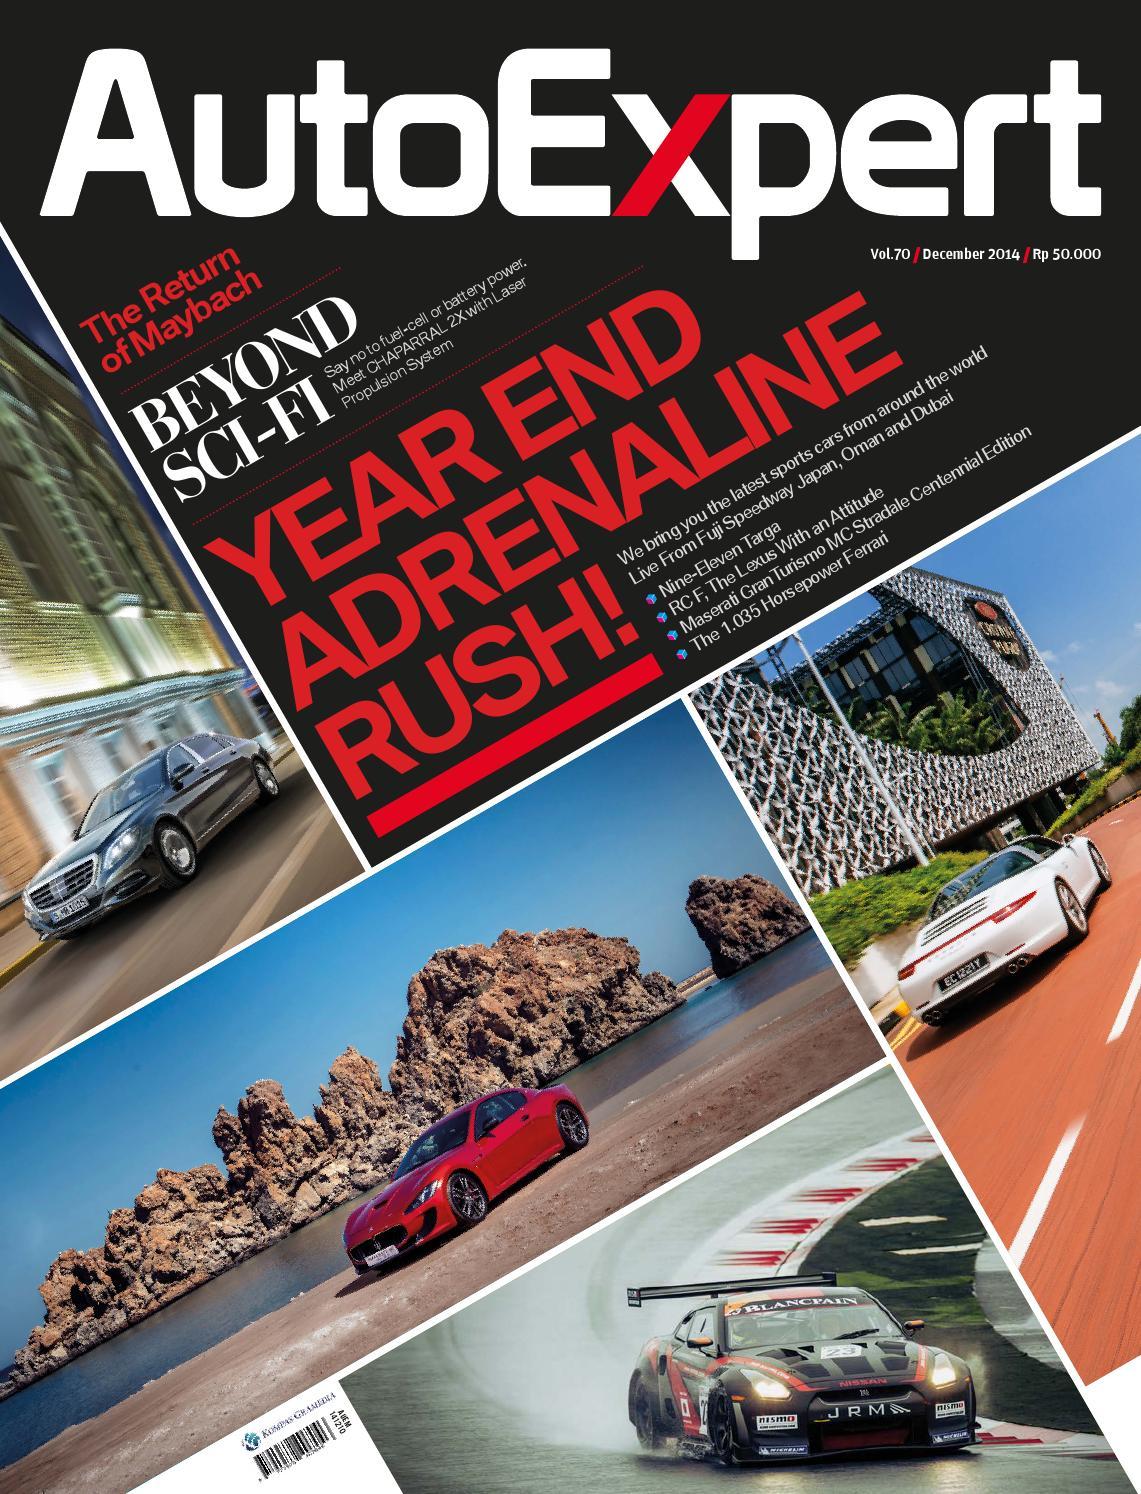 Autoexpert 70 indonesia automotive magz by fajar timur issuu